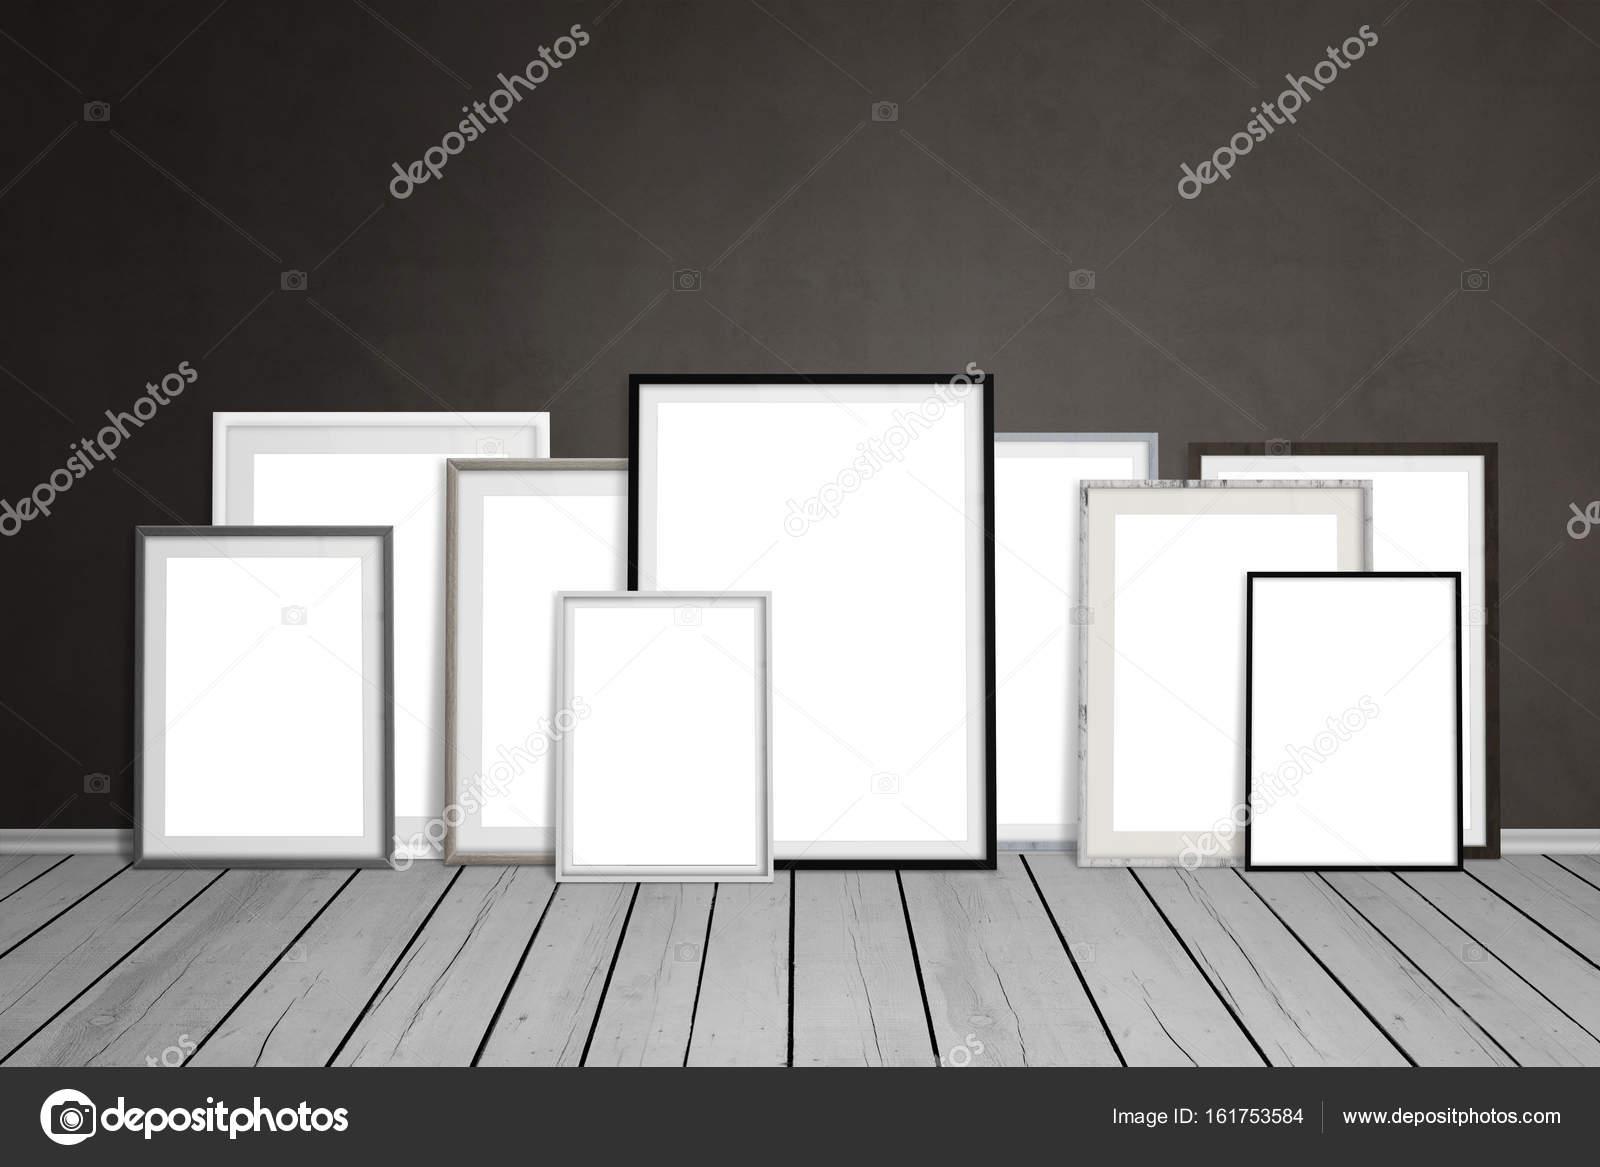 Mehrere leere Bilderrahmen an die Wand gelehnt — Stockfoto © vlado85 ...